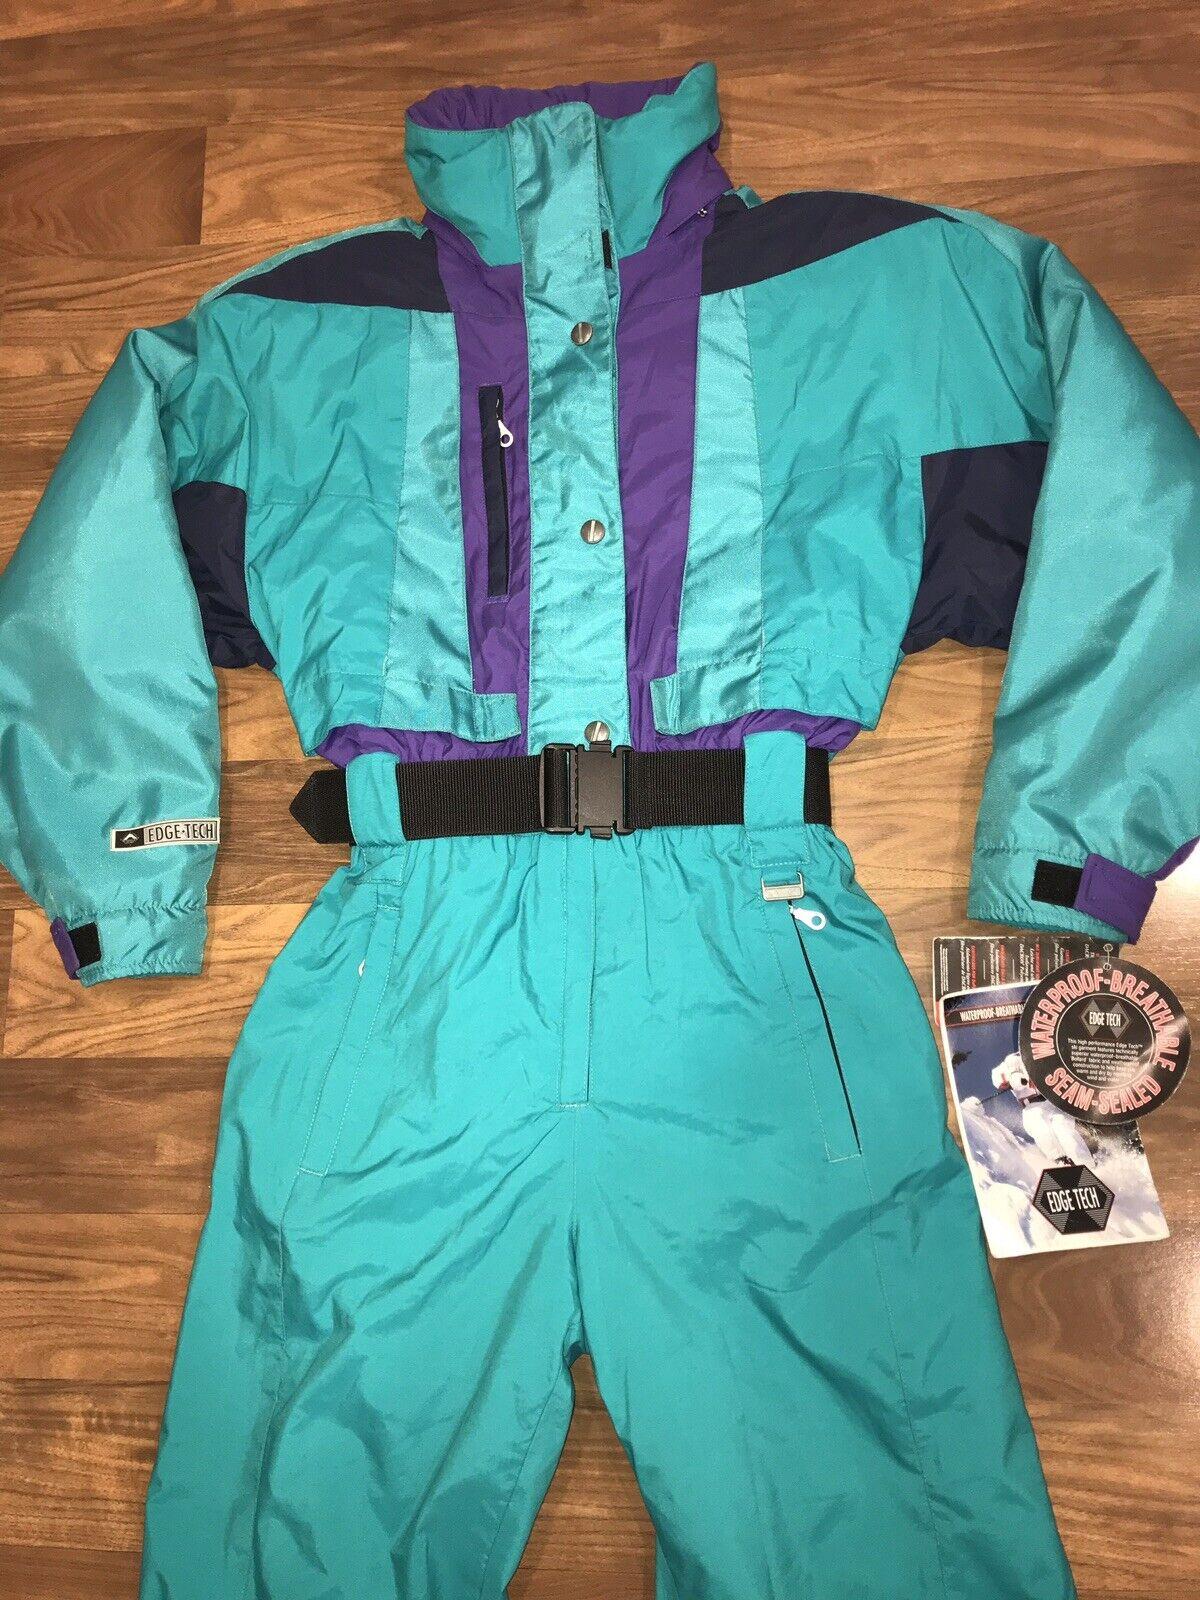 NEW Teal EDGE TECH Womens 10 One piece SKI SUIT Snow Bib vtg Snowsuit WATERPROOF